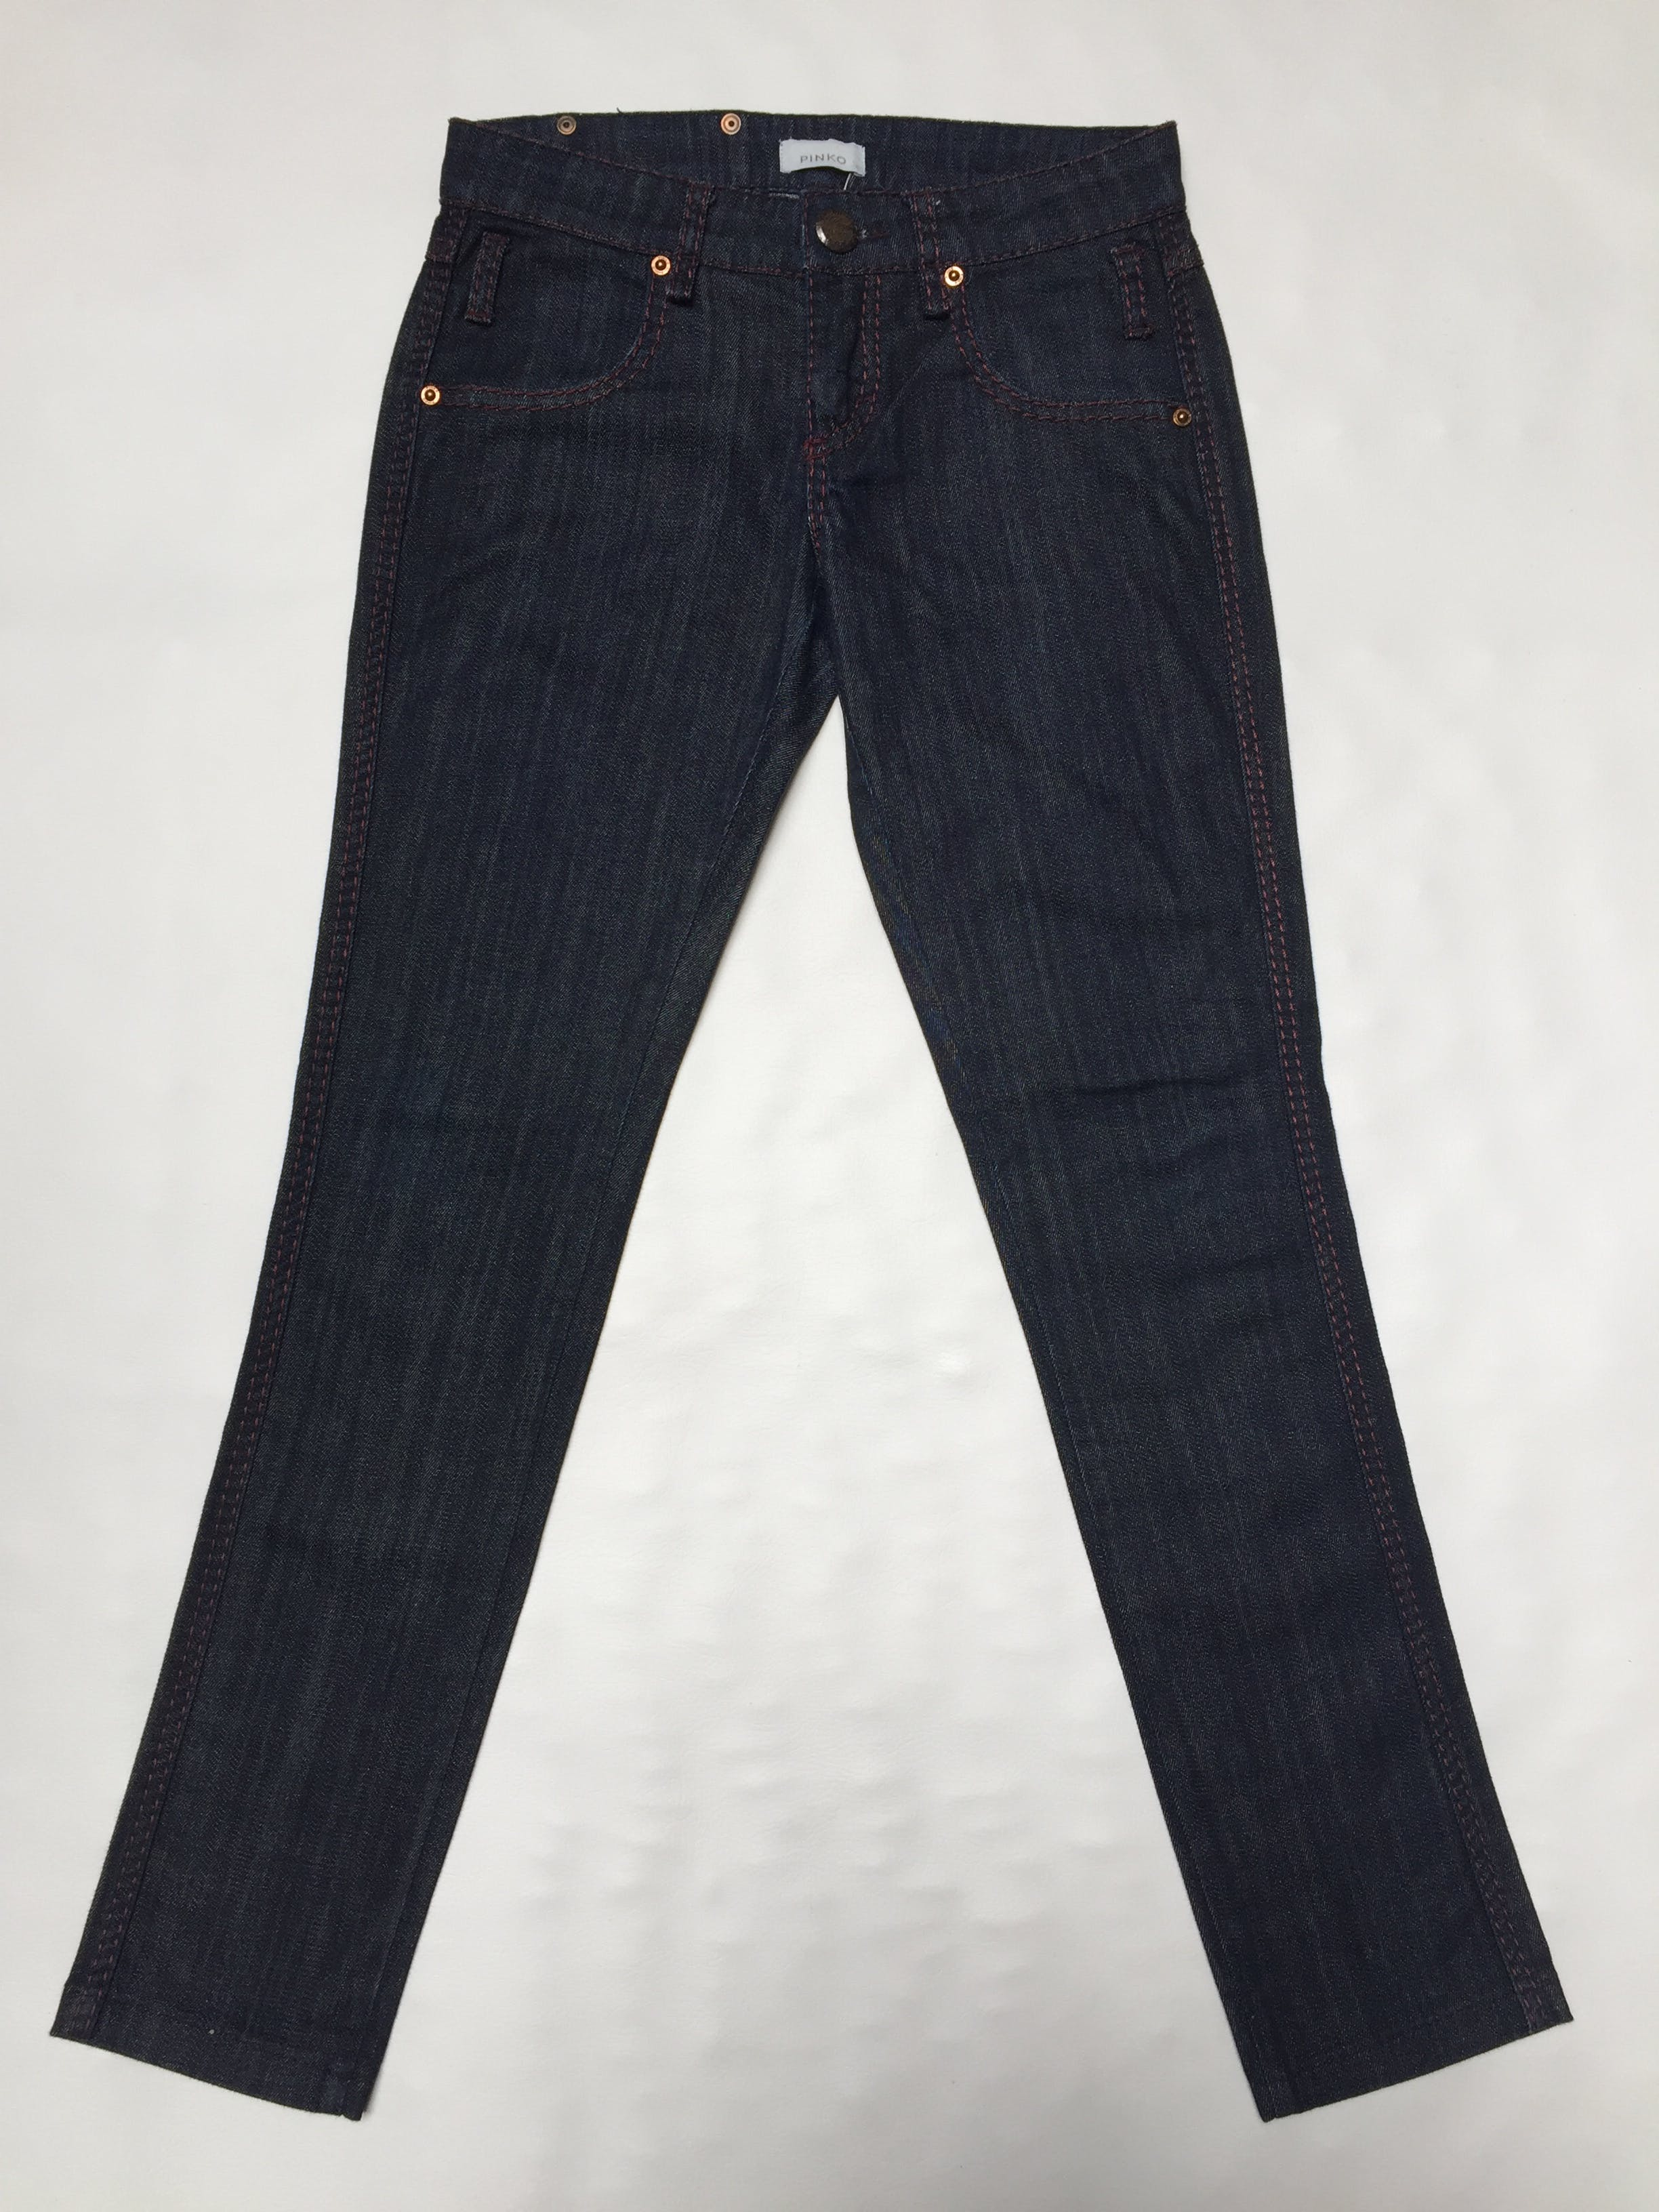 pantalon jean-Pinko-imagen